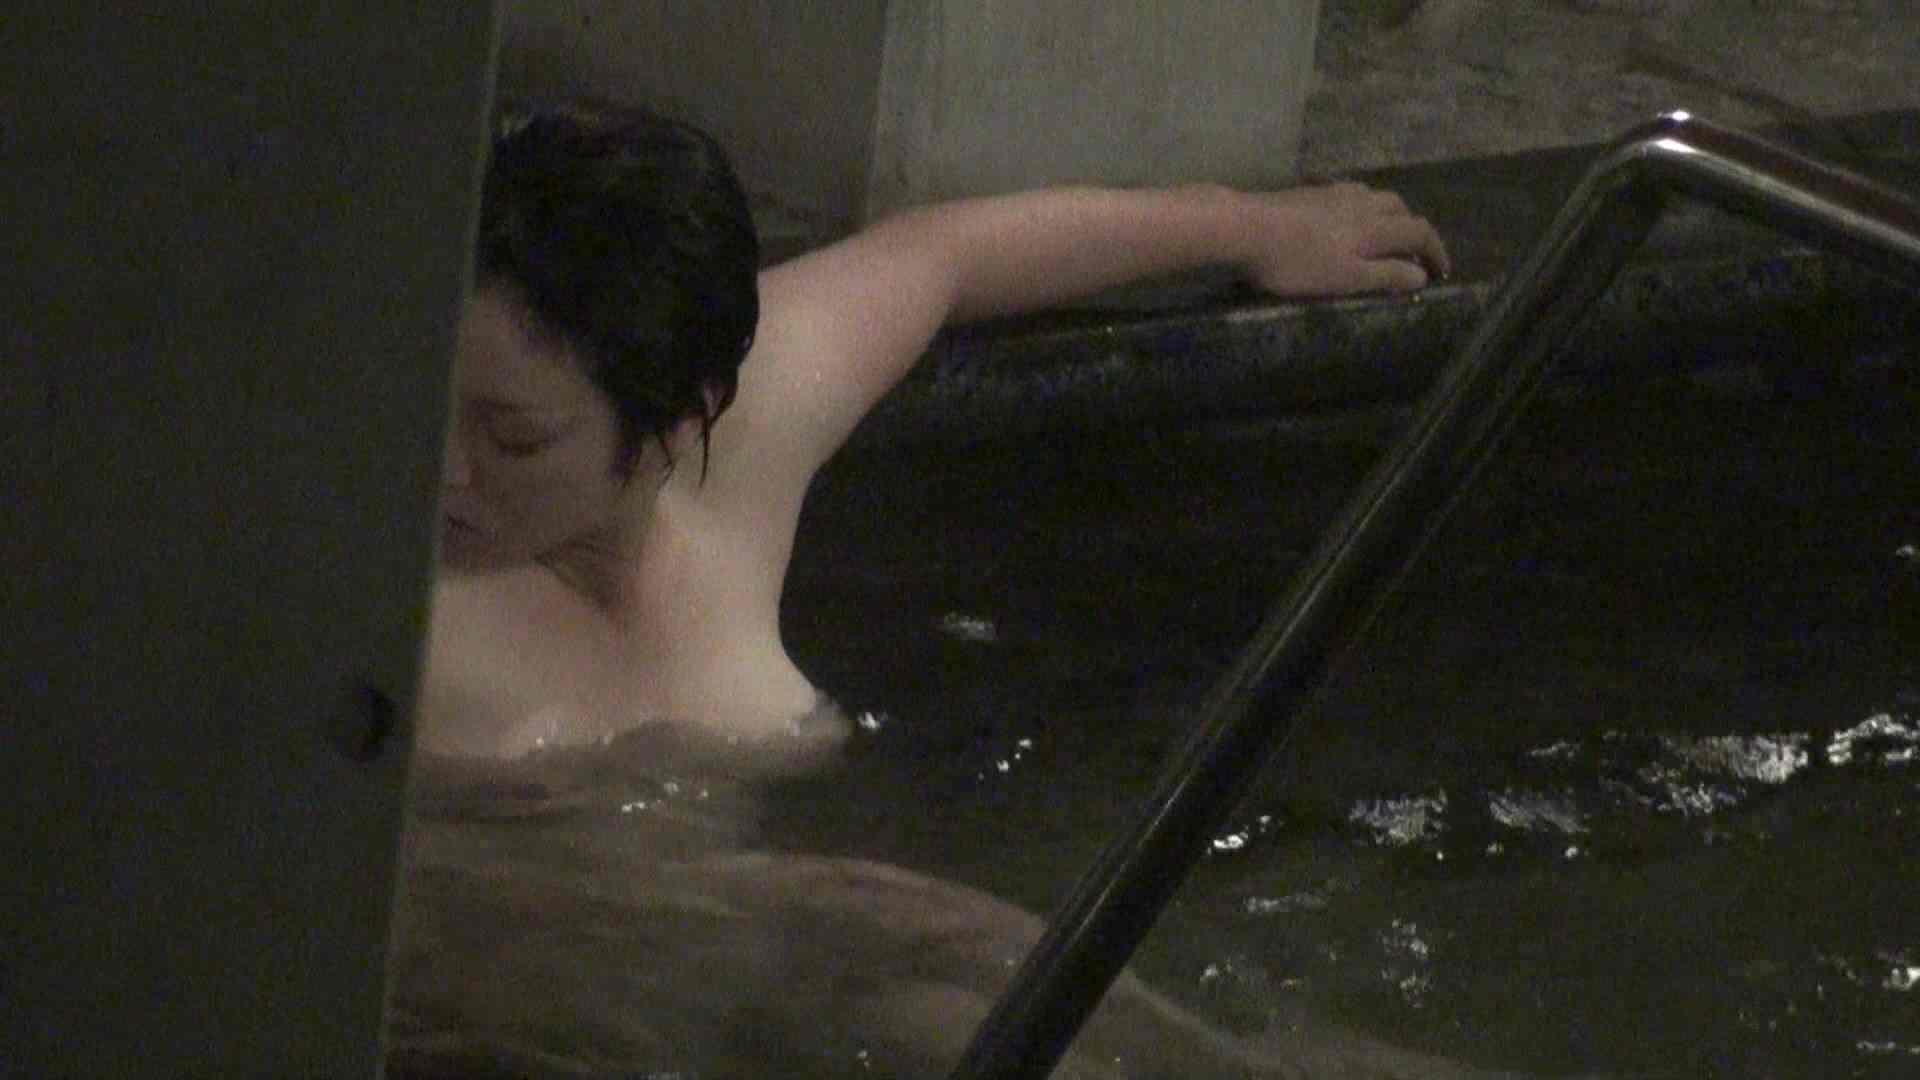 Aquaな露天風呂Vol.338 露天風呂編  82PIX 48